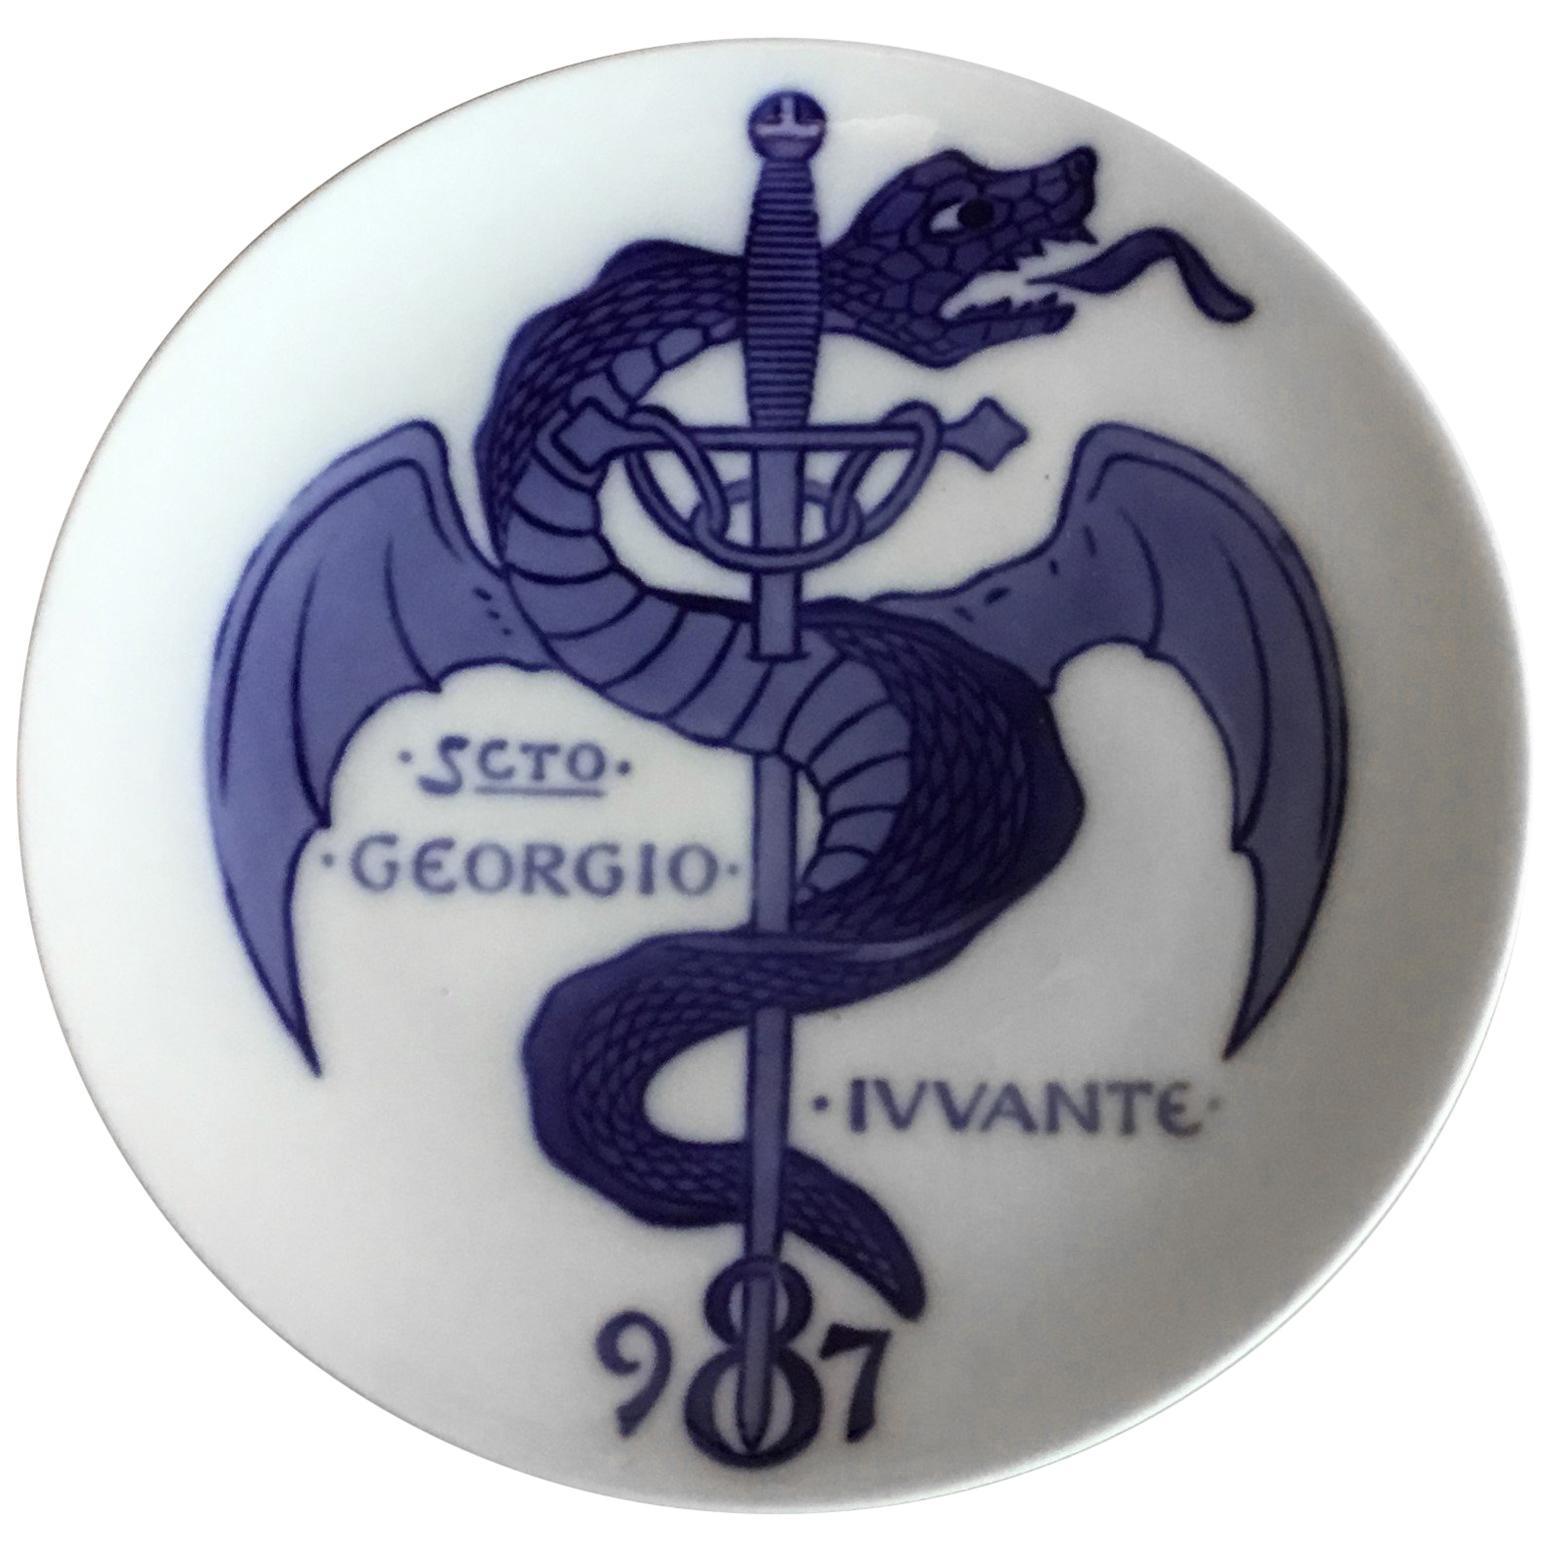 Royal Copenhagen Commemorative Plate from 1897 RC-CM14